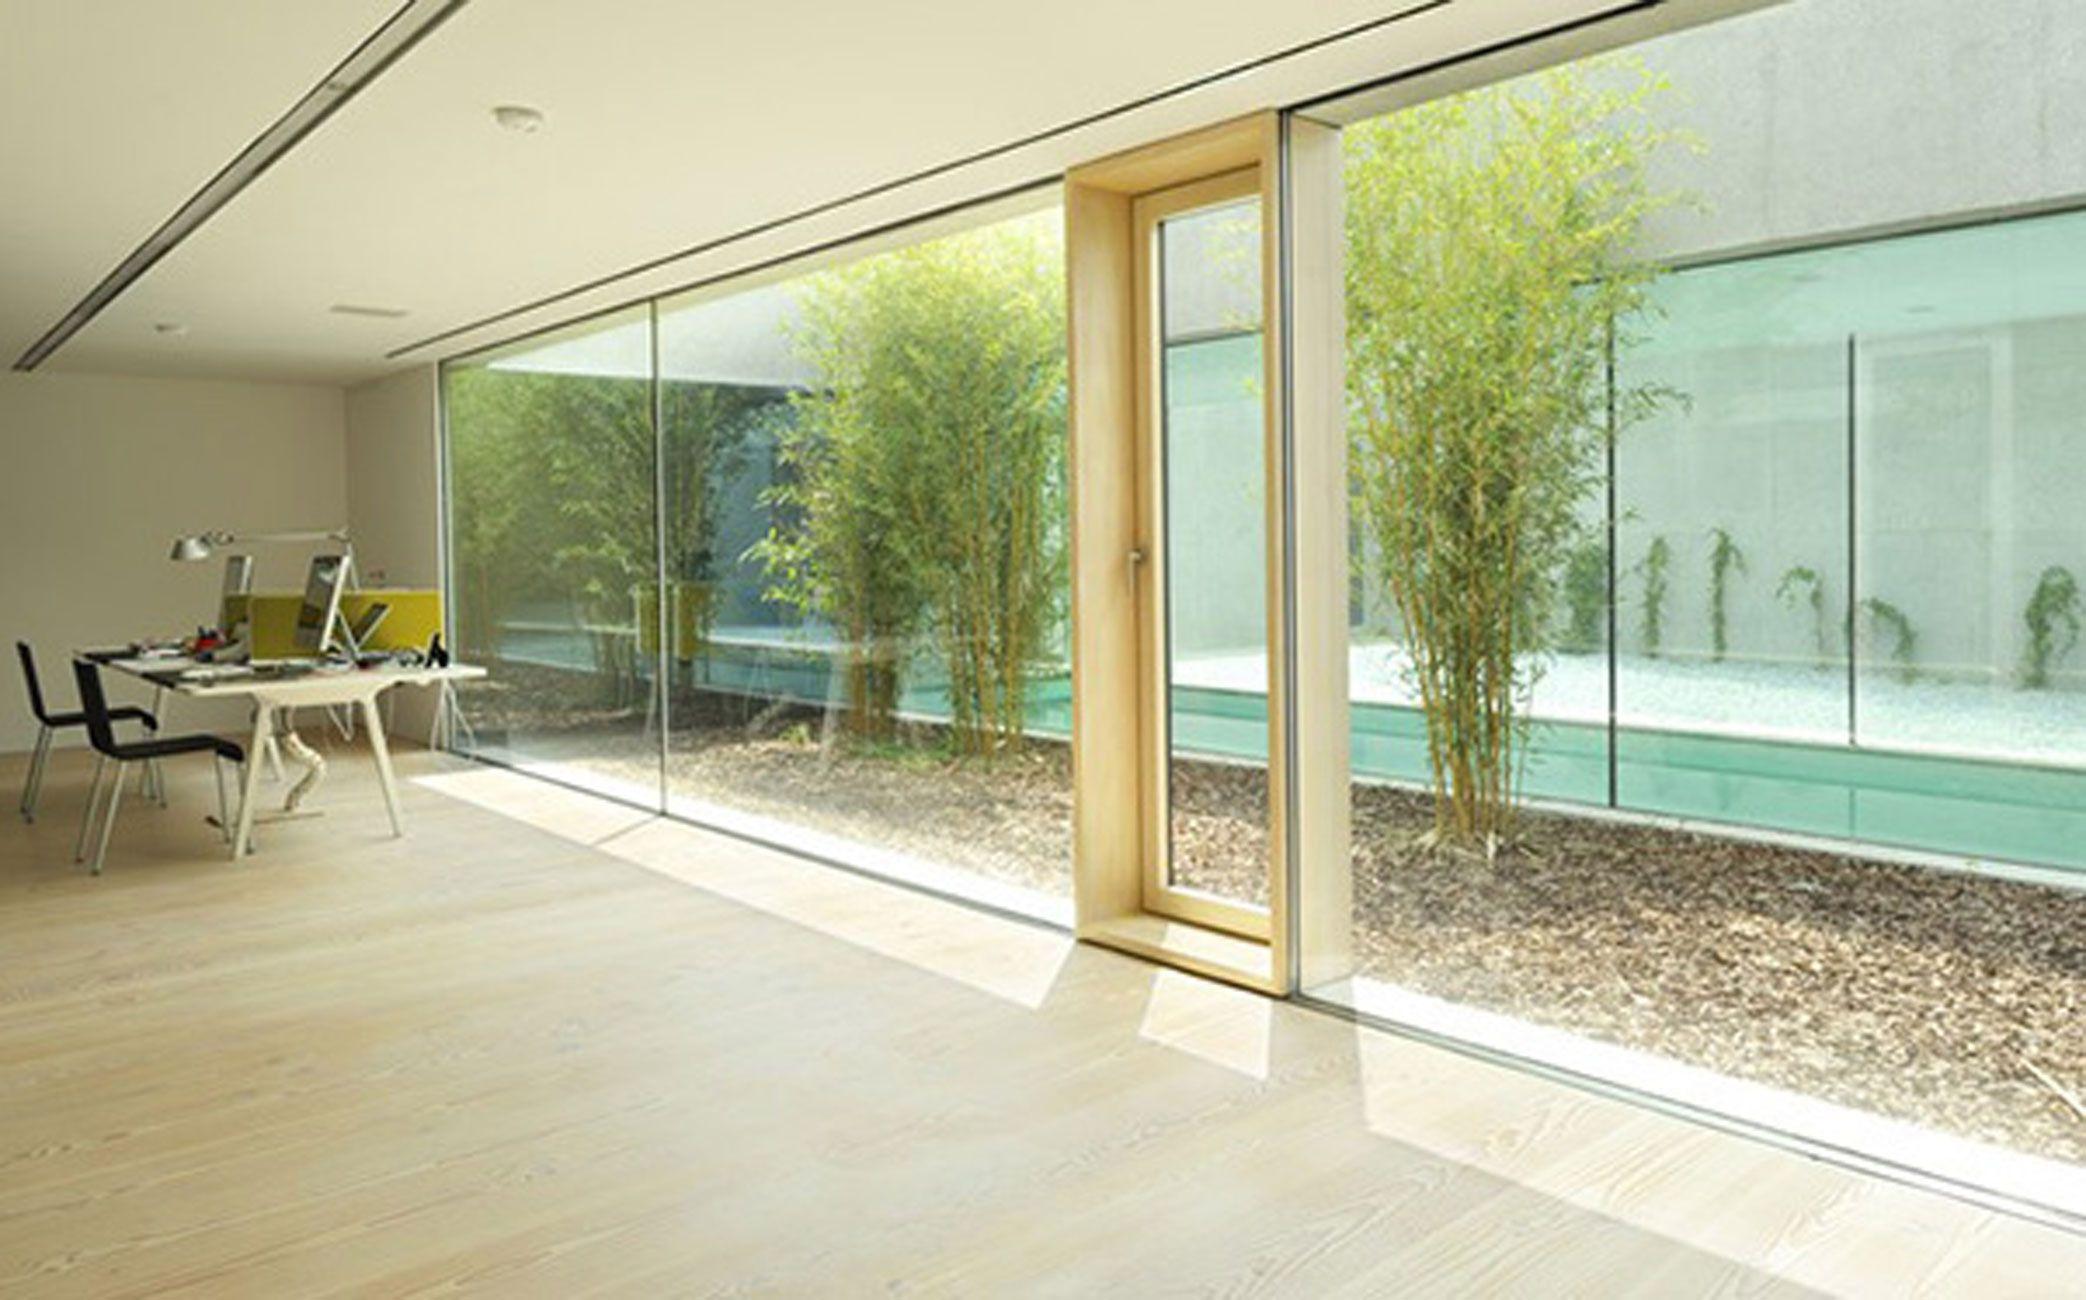 Image result for indoor terrace | ADt - around details | Pinterest